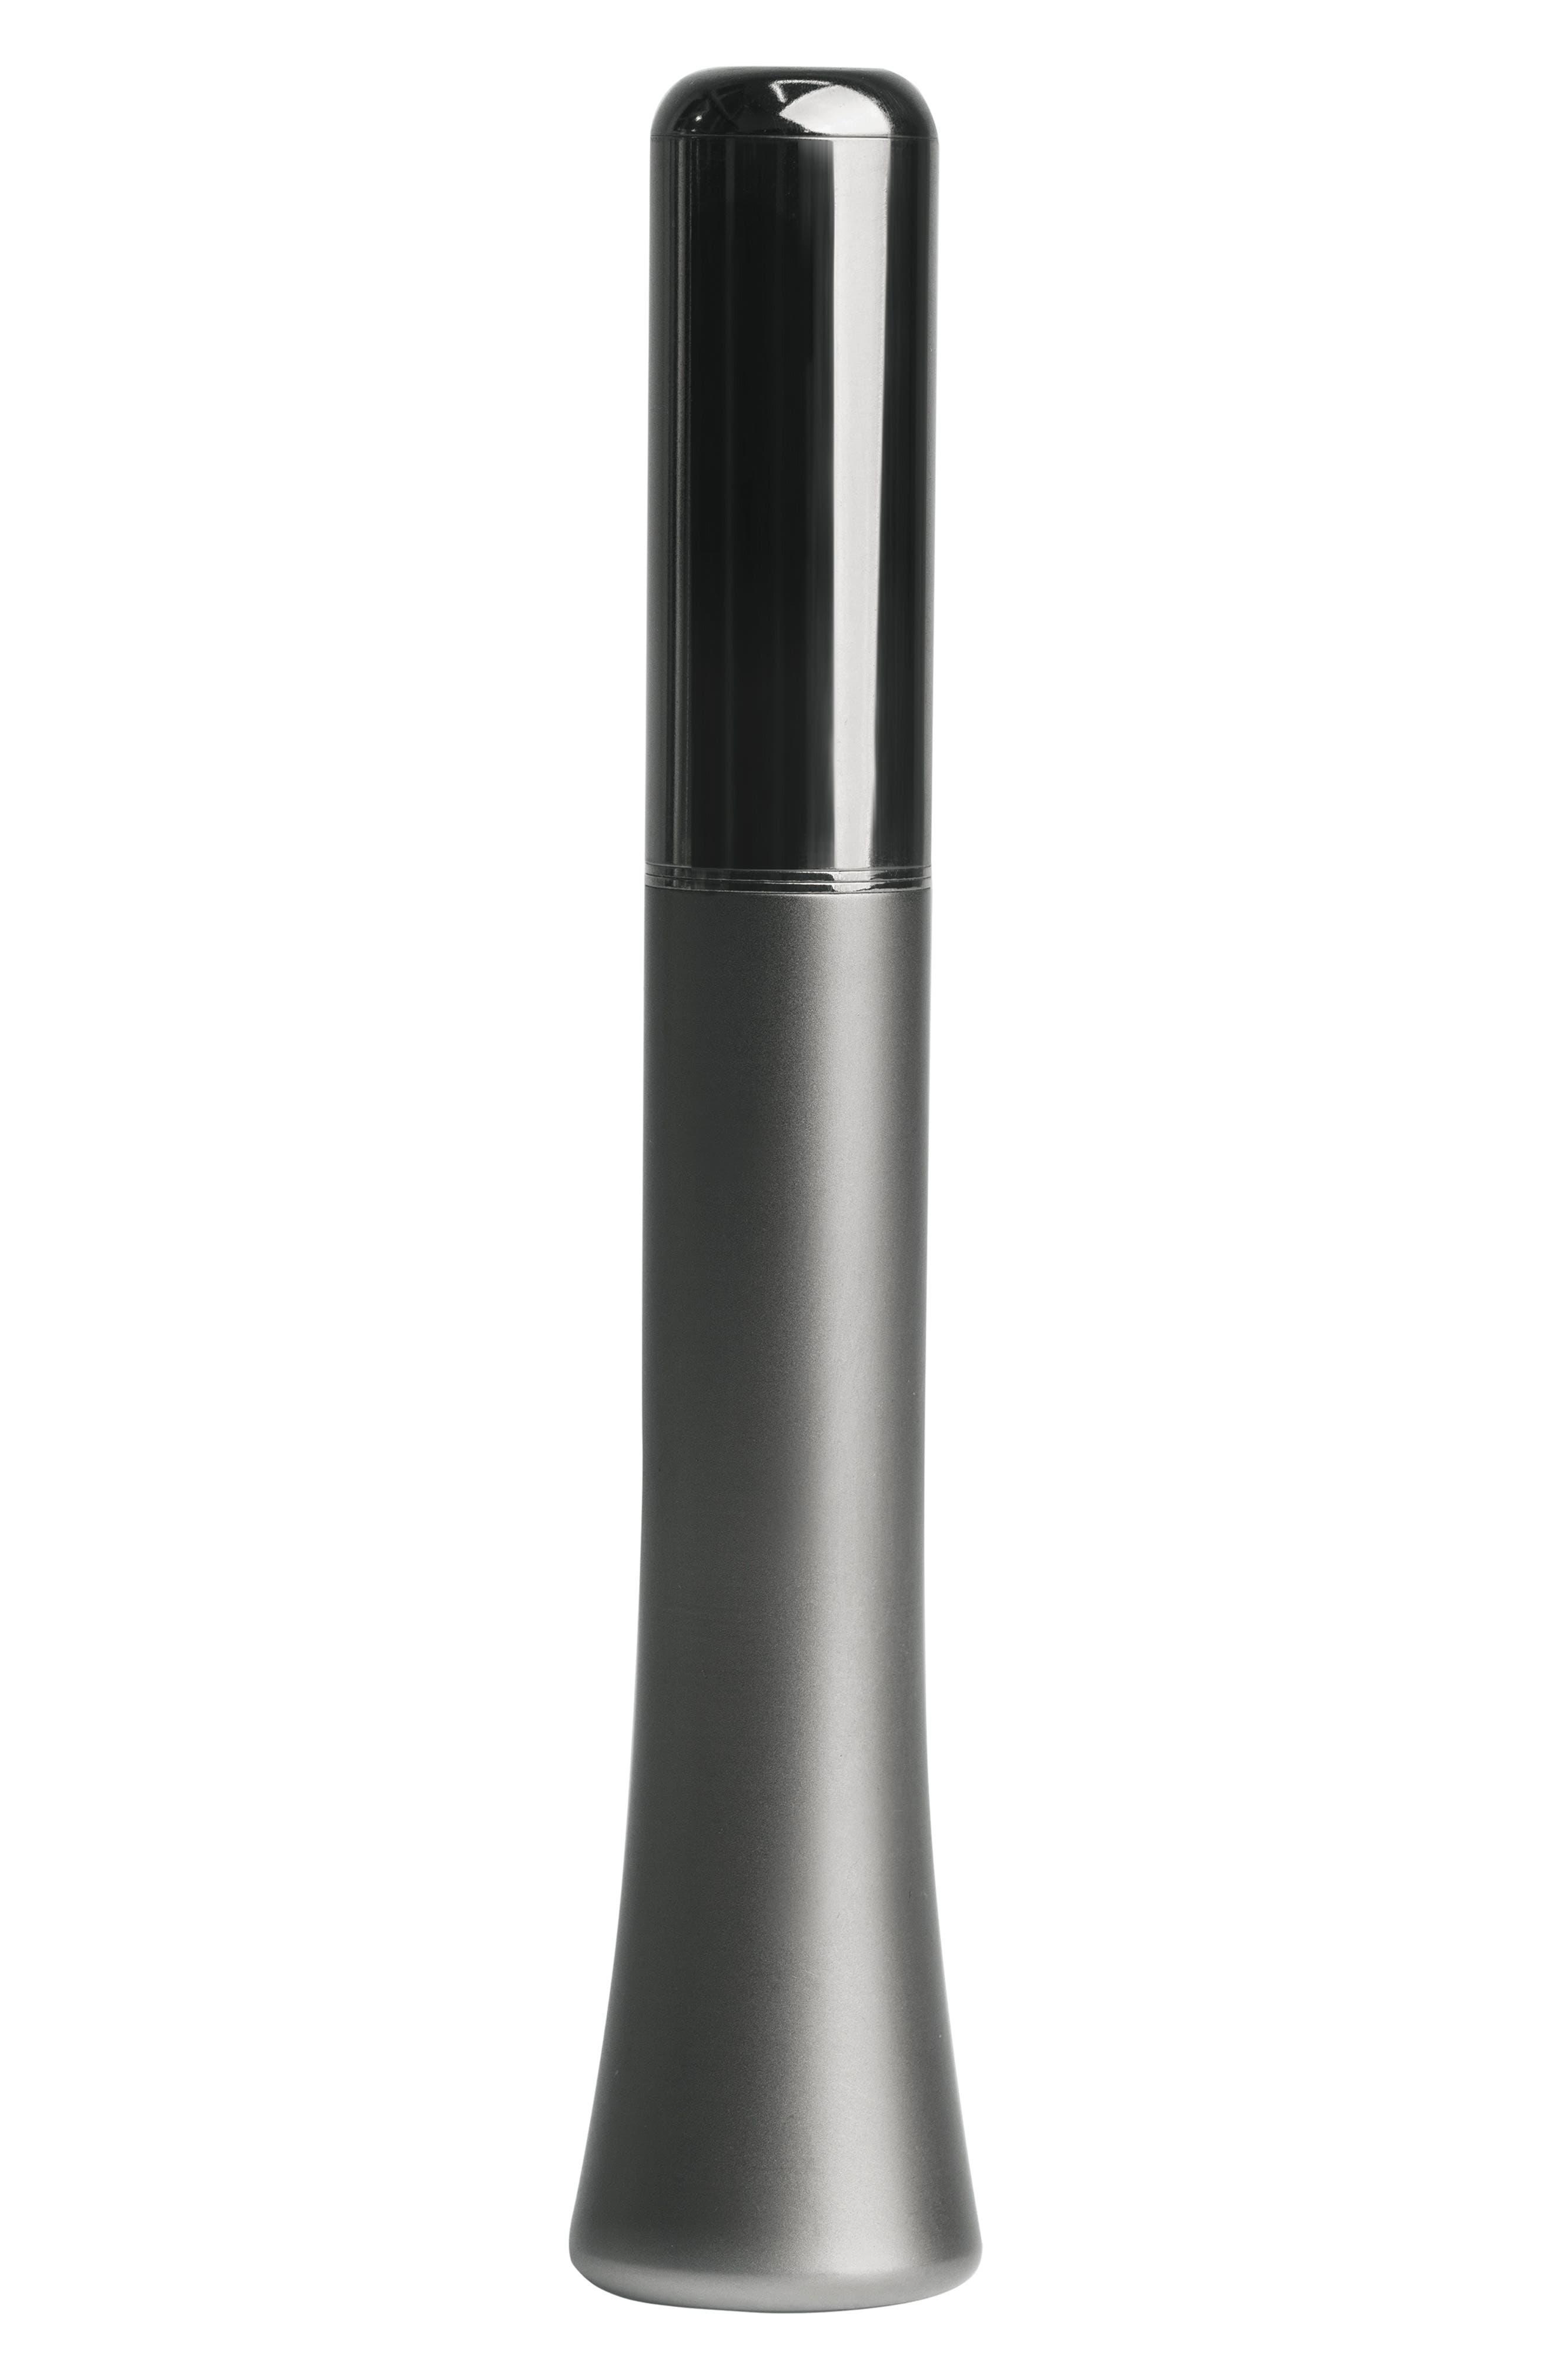 Wink+ Vibrator